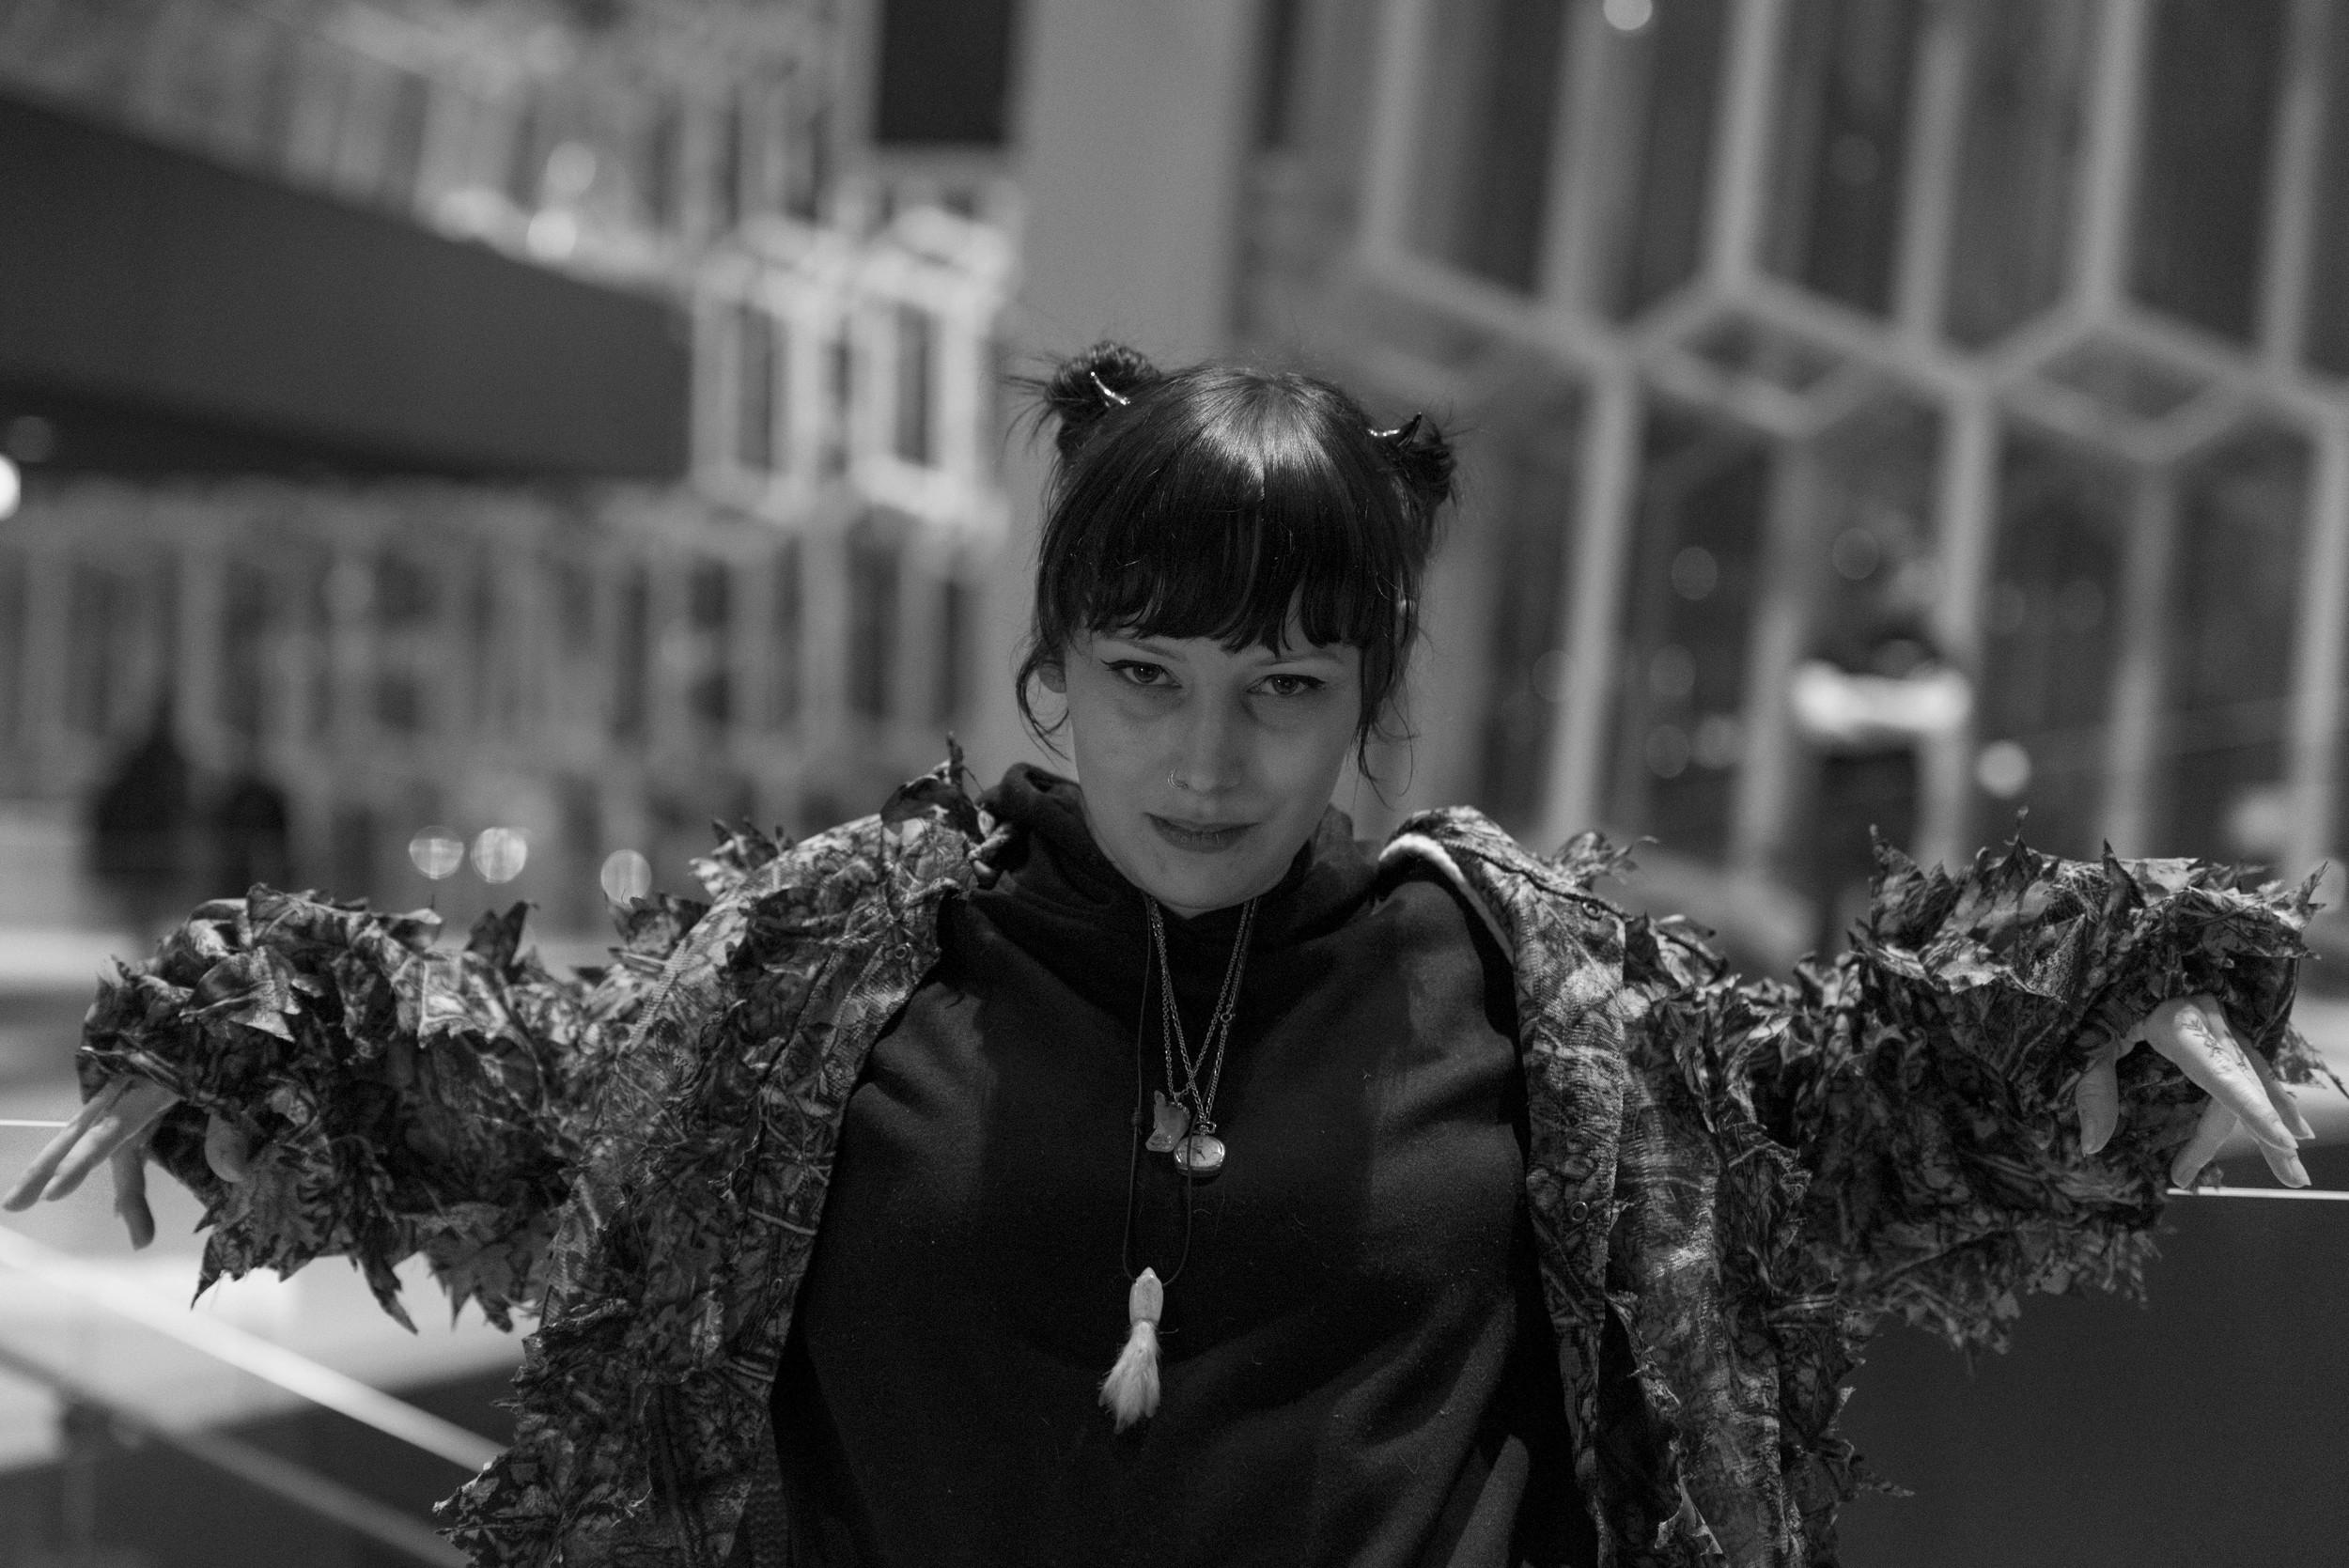 Sonar Reykjavik Iceland Black and White Portraits-6.jpg